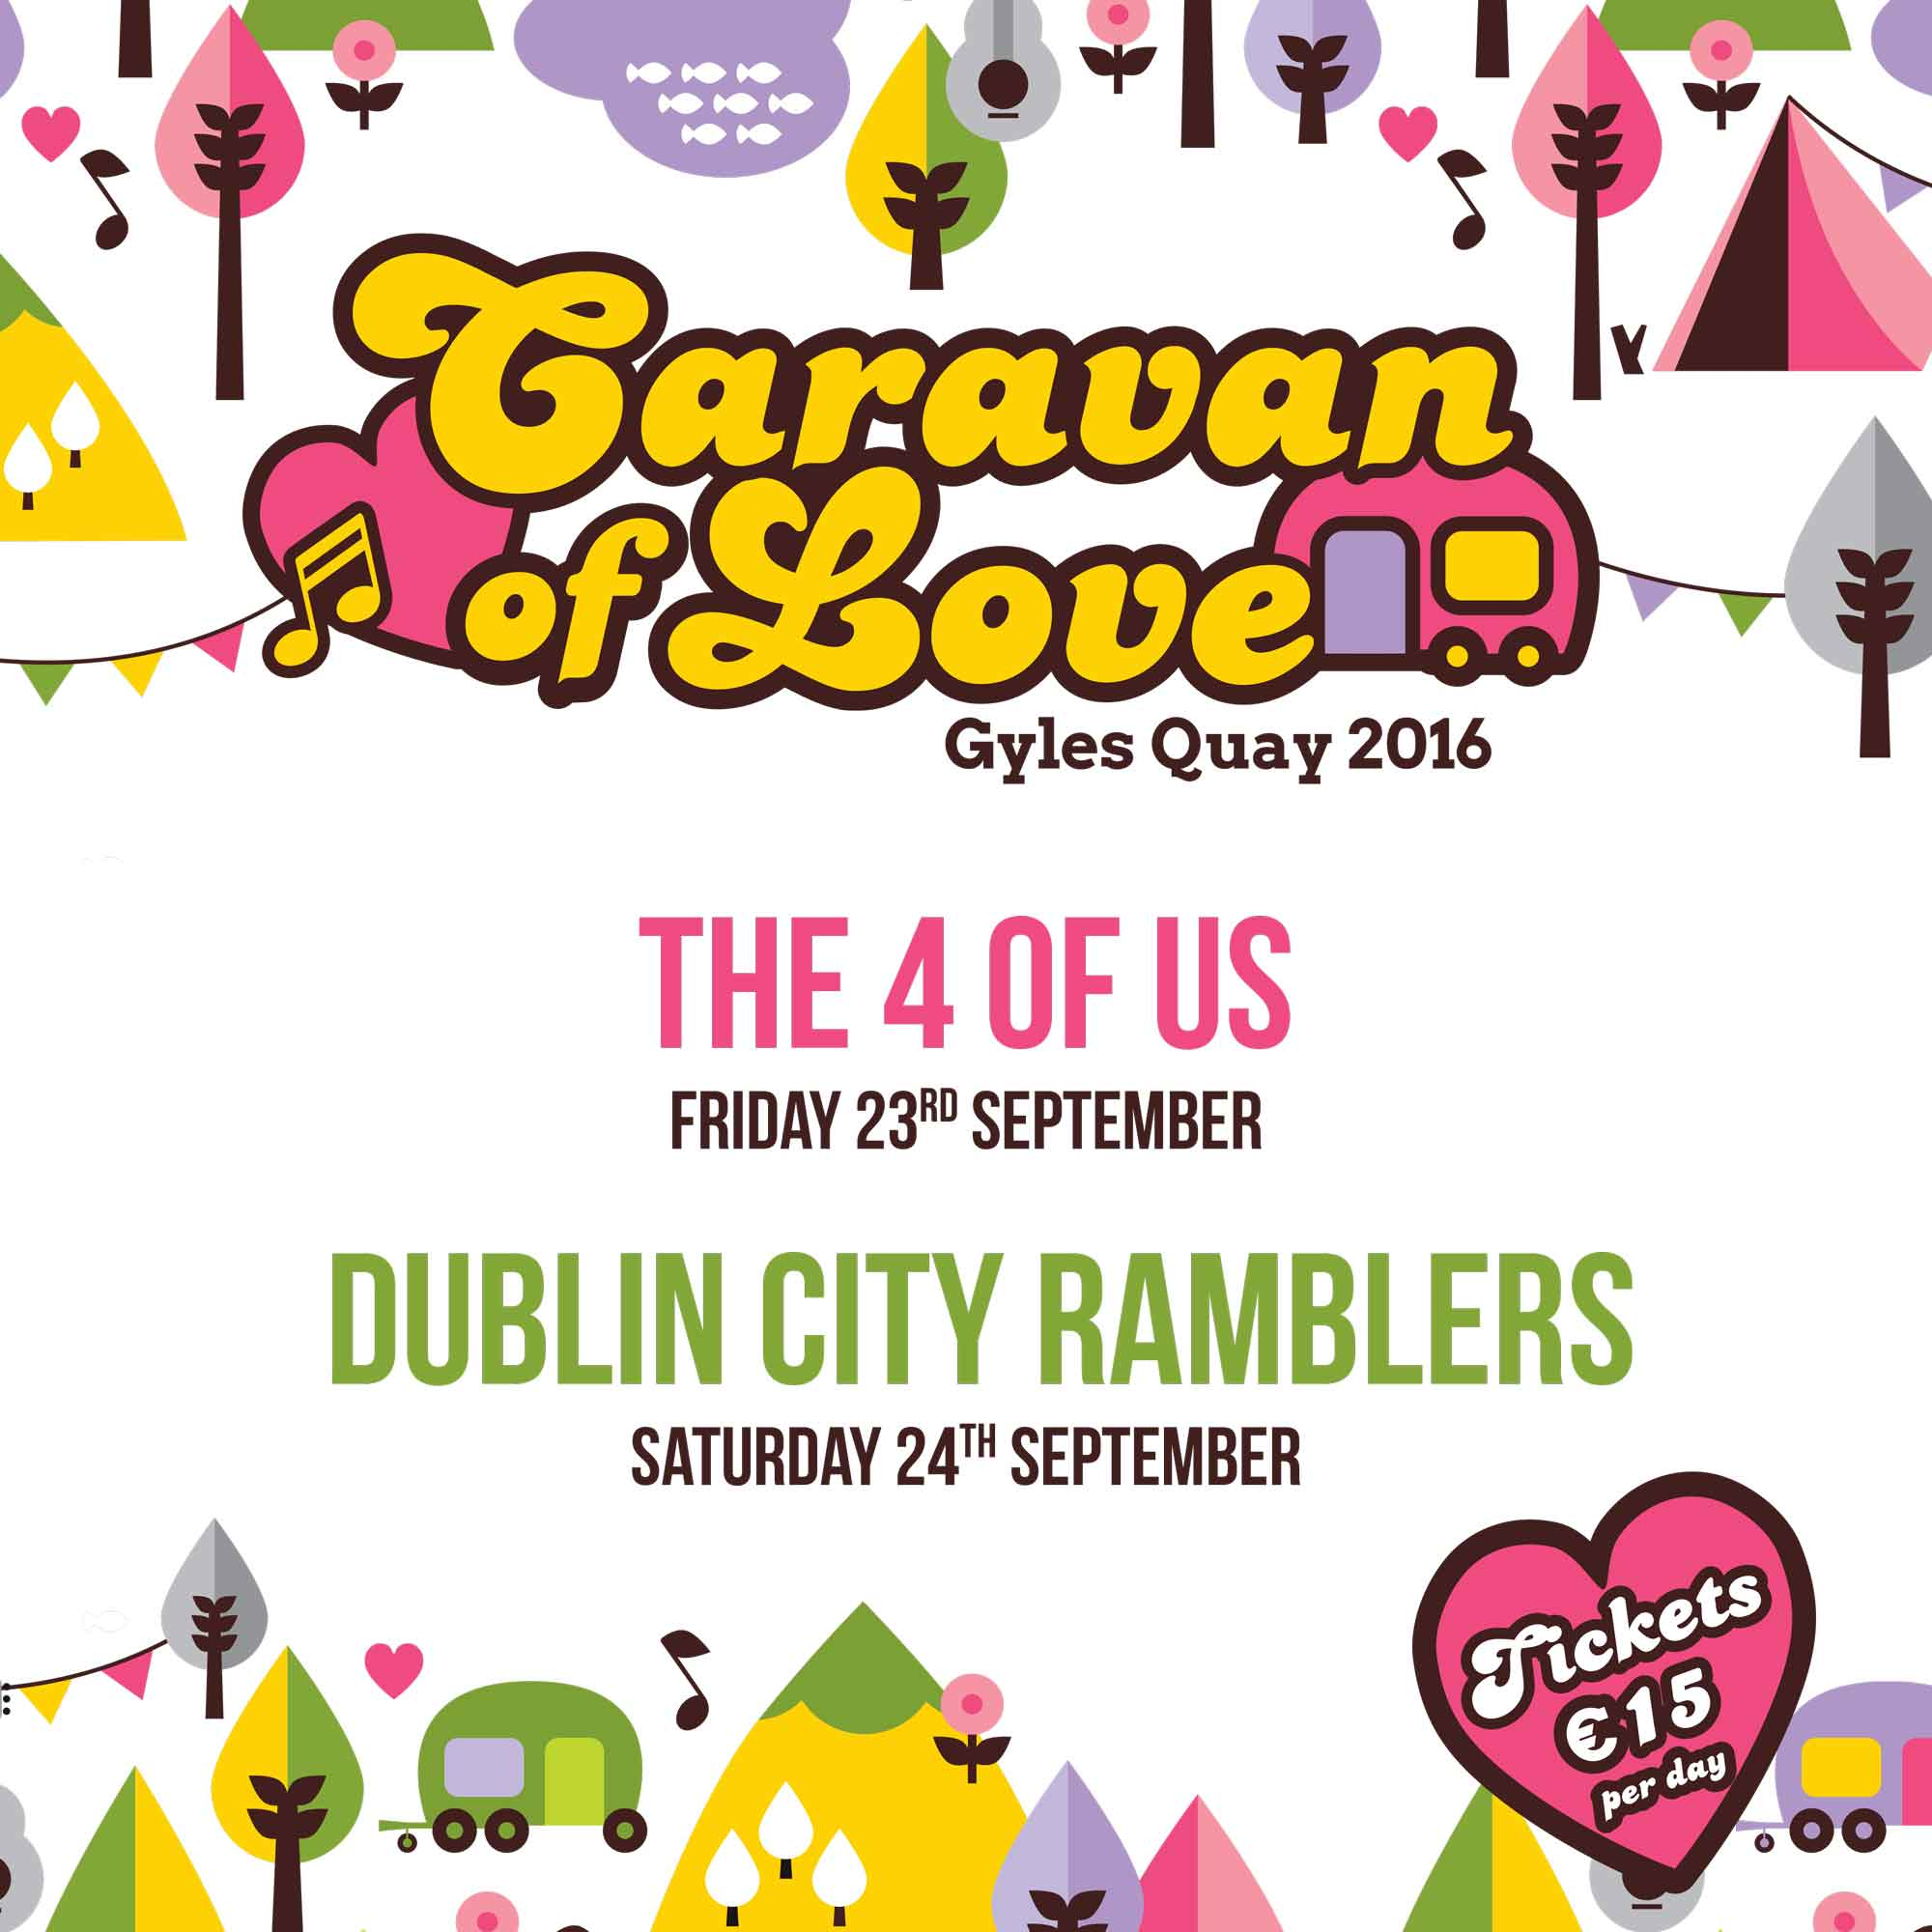 Caravan of Love 2016 - Music Festival - Gyles Quay